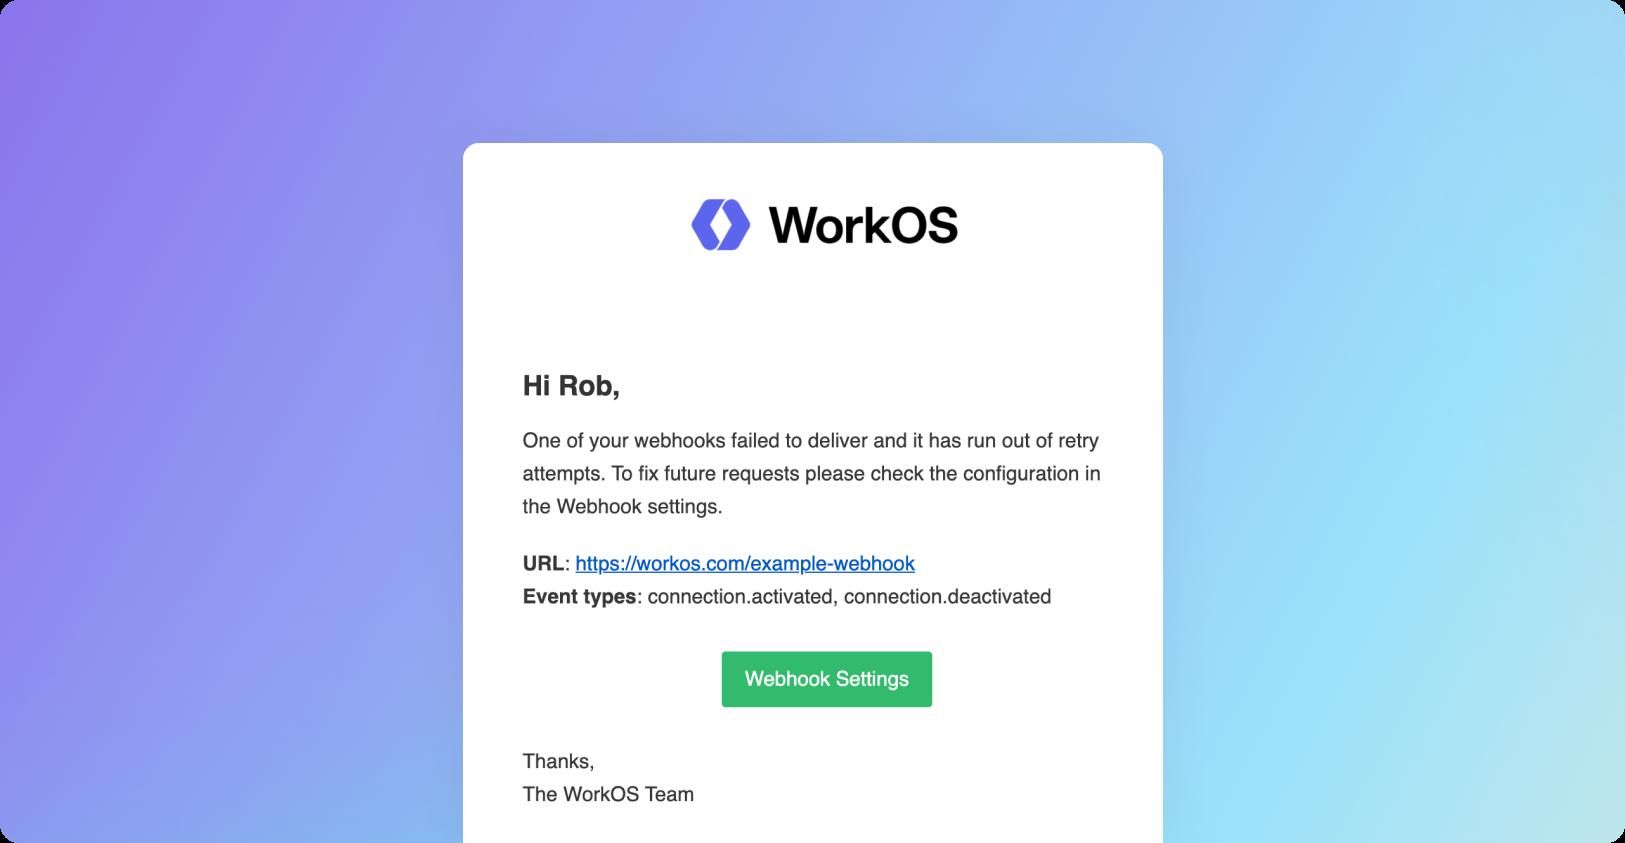 Webhook Failure Notifications